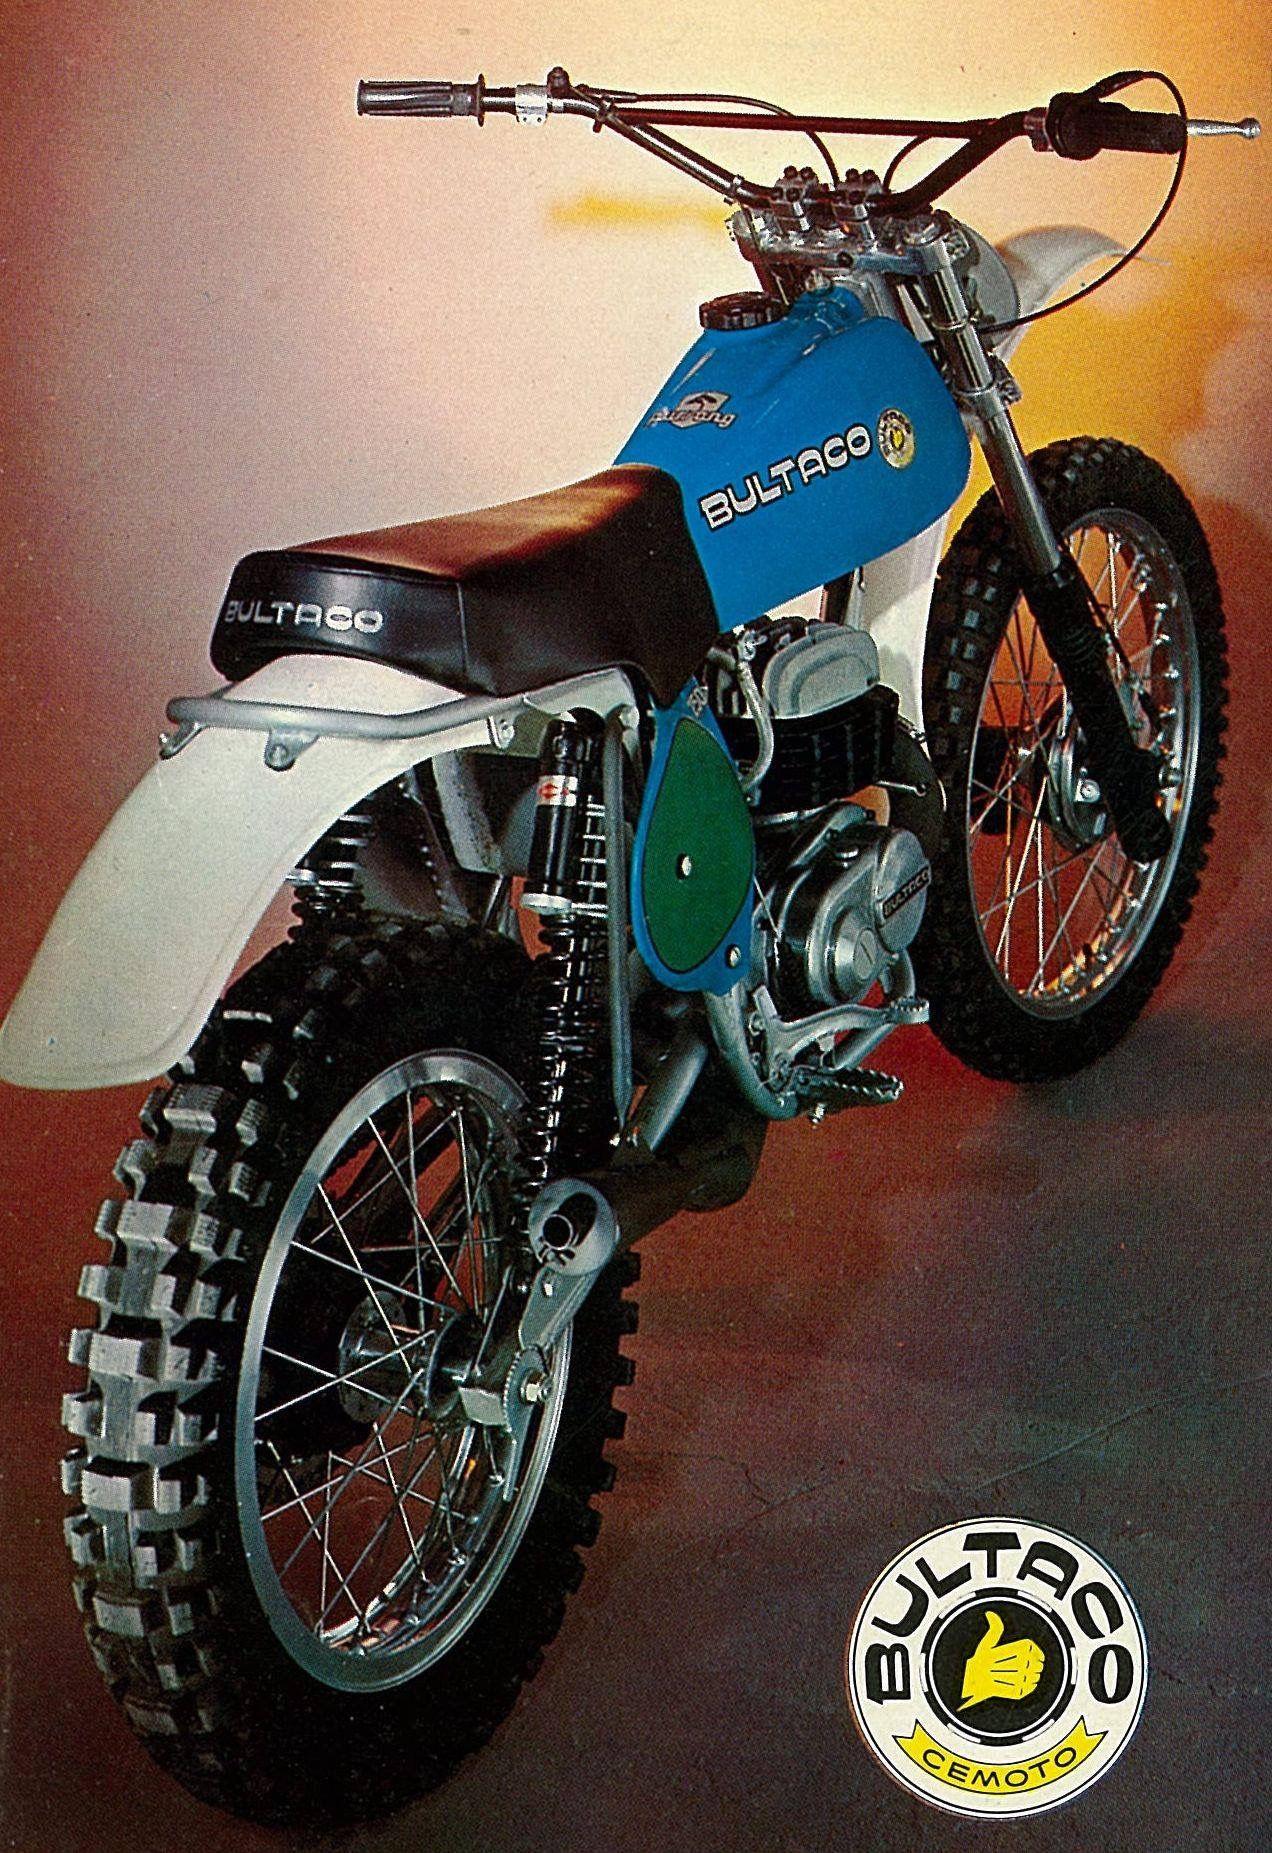 BULTACO PURSANG 250 CC | Bultaco OFF Road | Enduro motorcycle